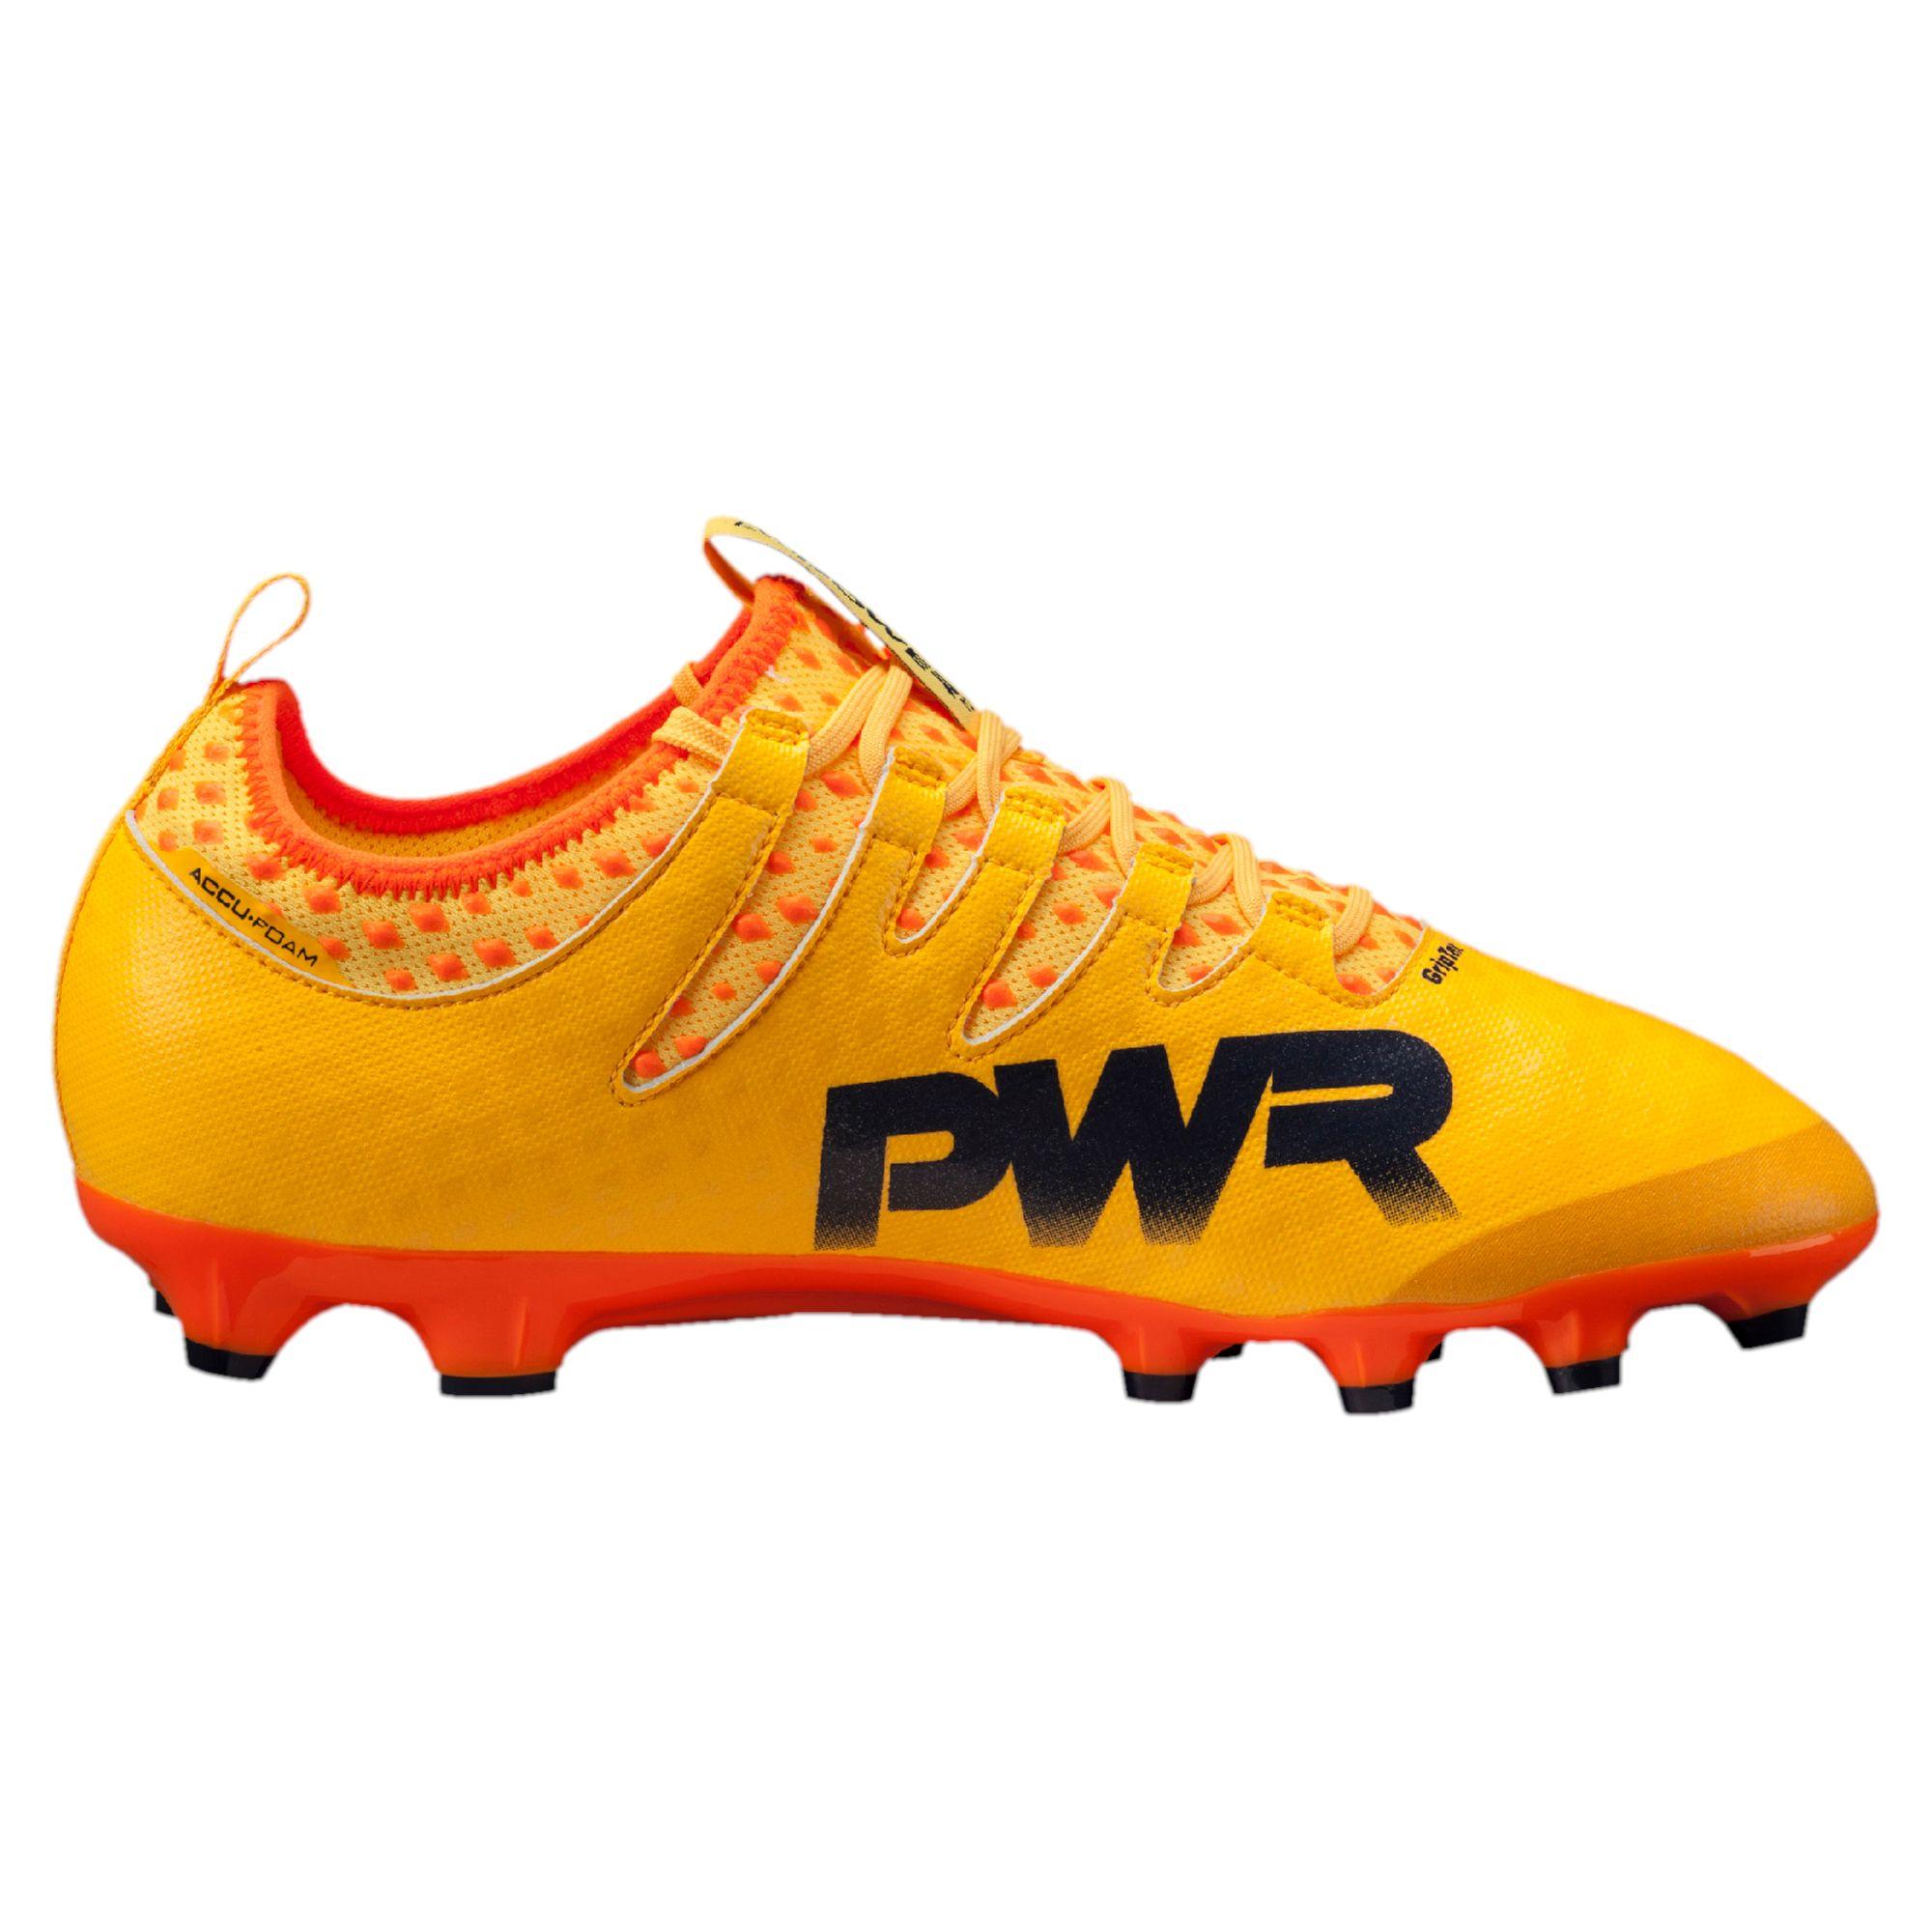 PUMA-evoPOWER-Vigor-2-AG-Men-s-Football-Boots-Hombre-Zapatos-Futbol-Nuevo miniatura 9